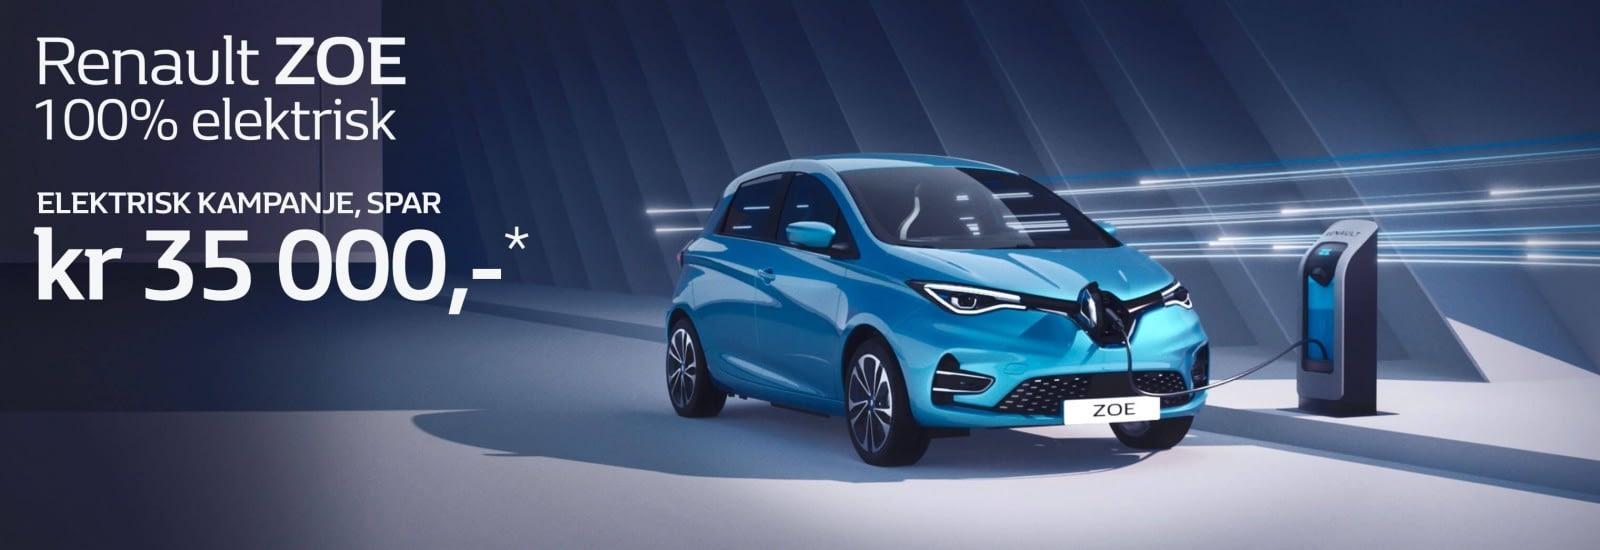 Renault Zoe elektrisk kampanje